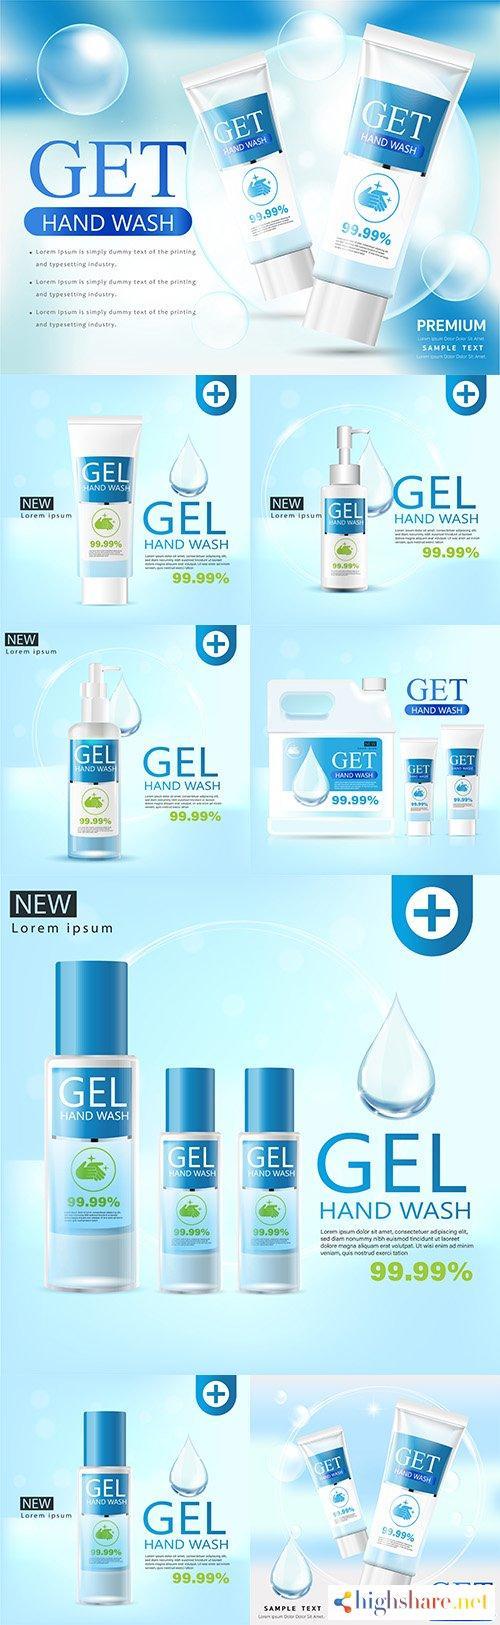 medical hand washing gel clear bottle 3d illustration 5f3fec38ebf12 - Medical hand washing gel, clear bottle 3d illustration